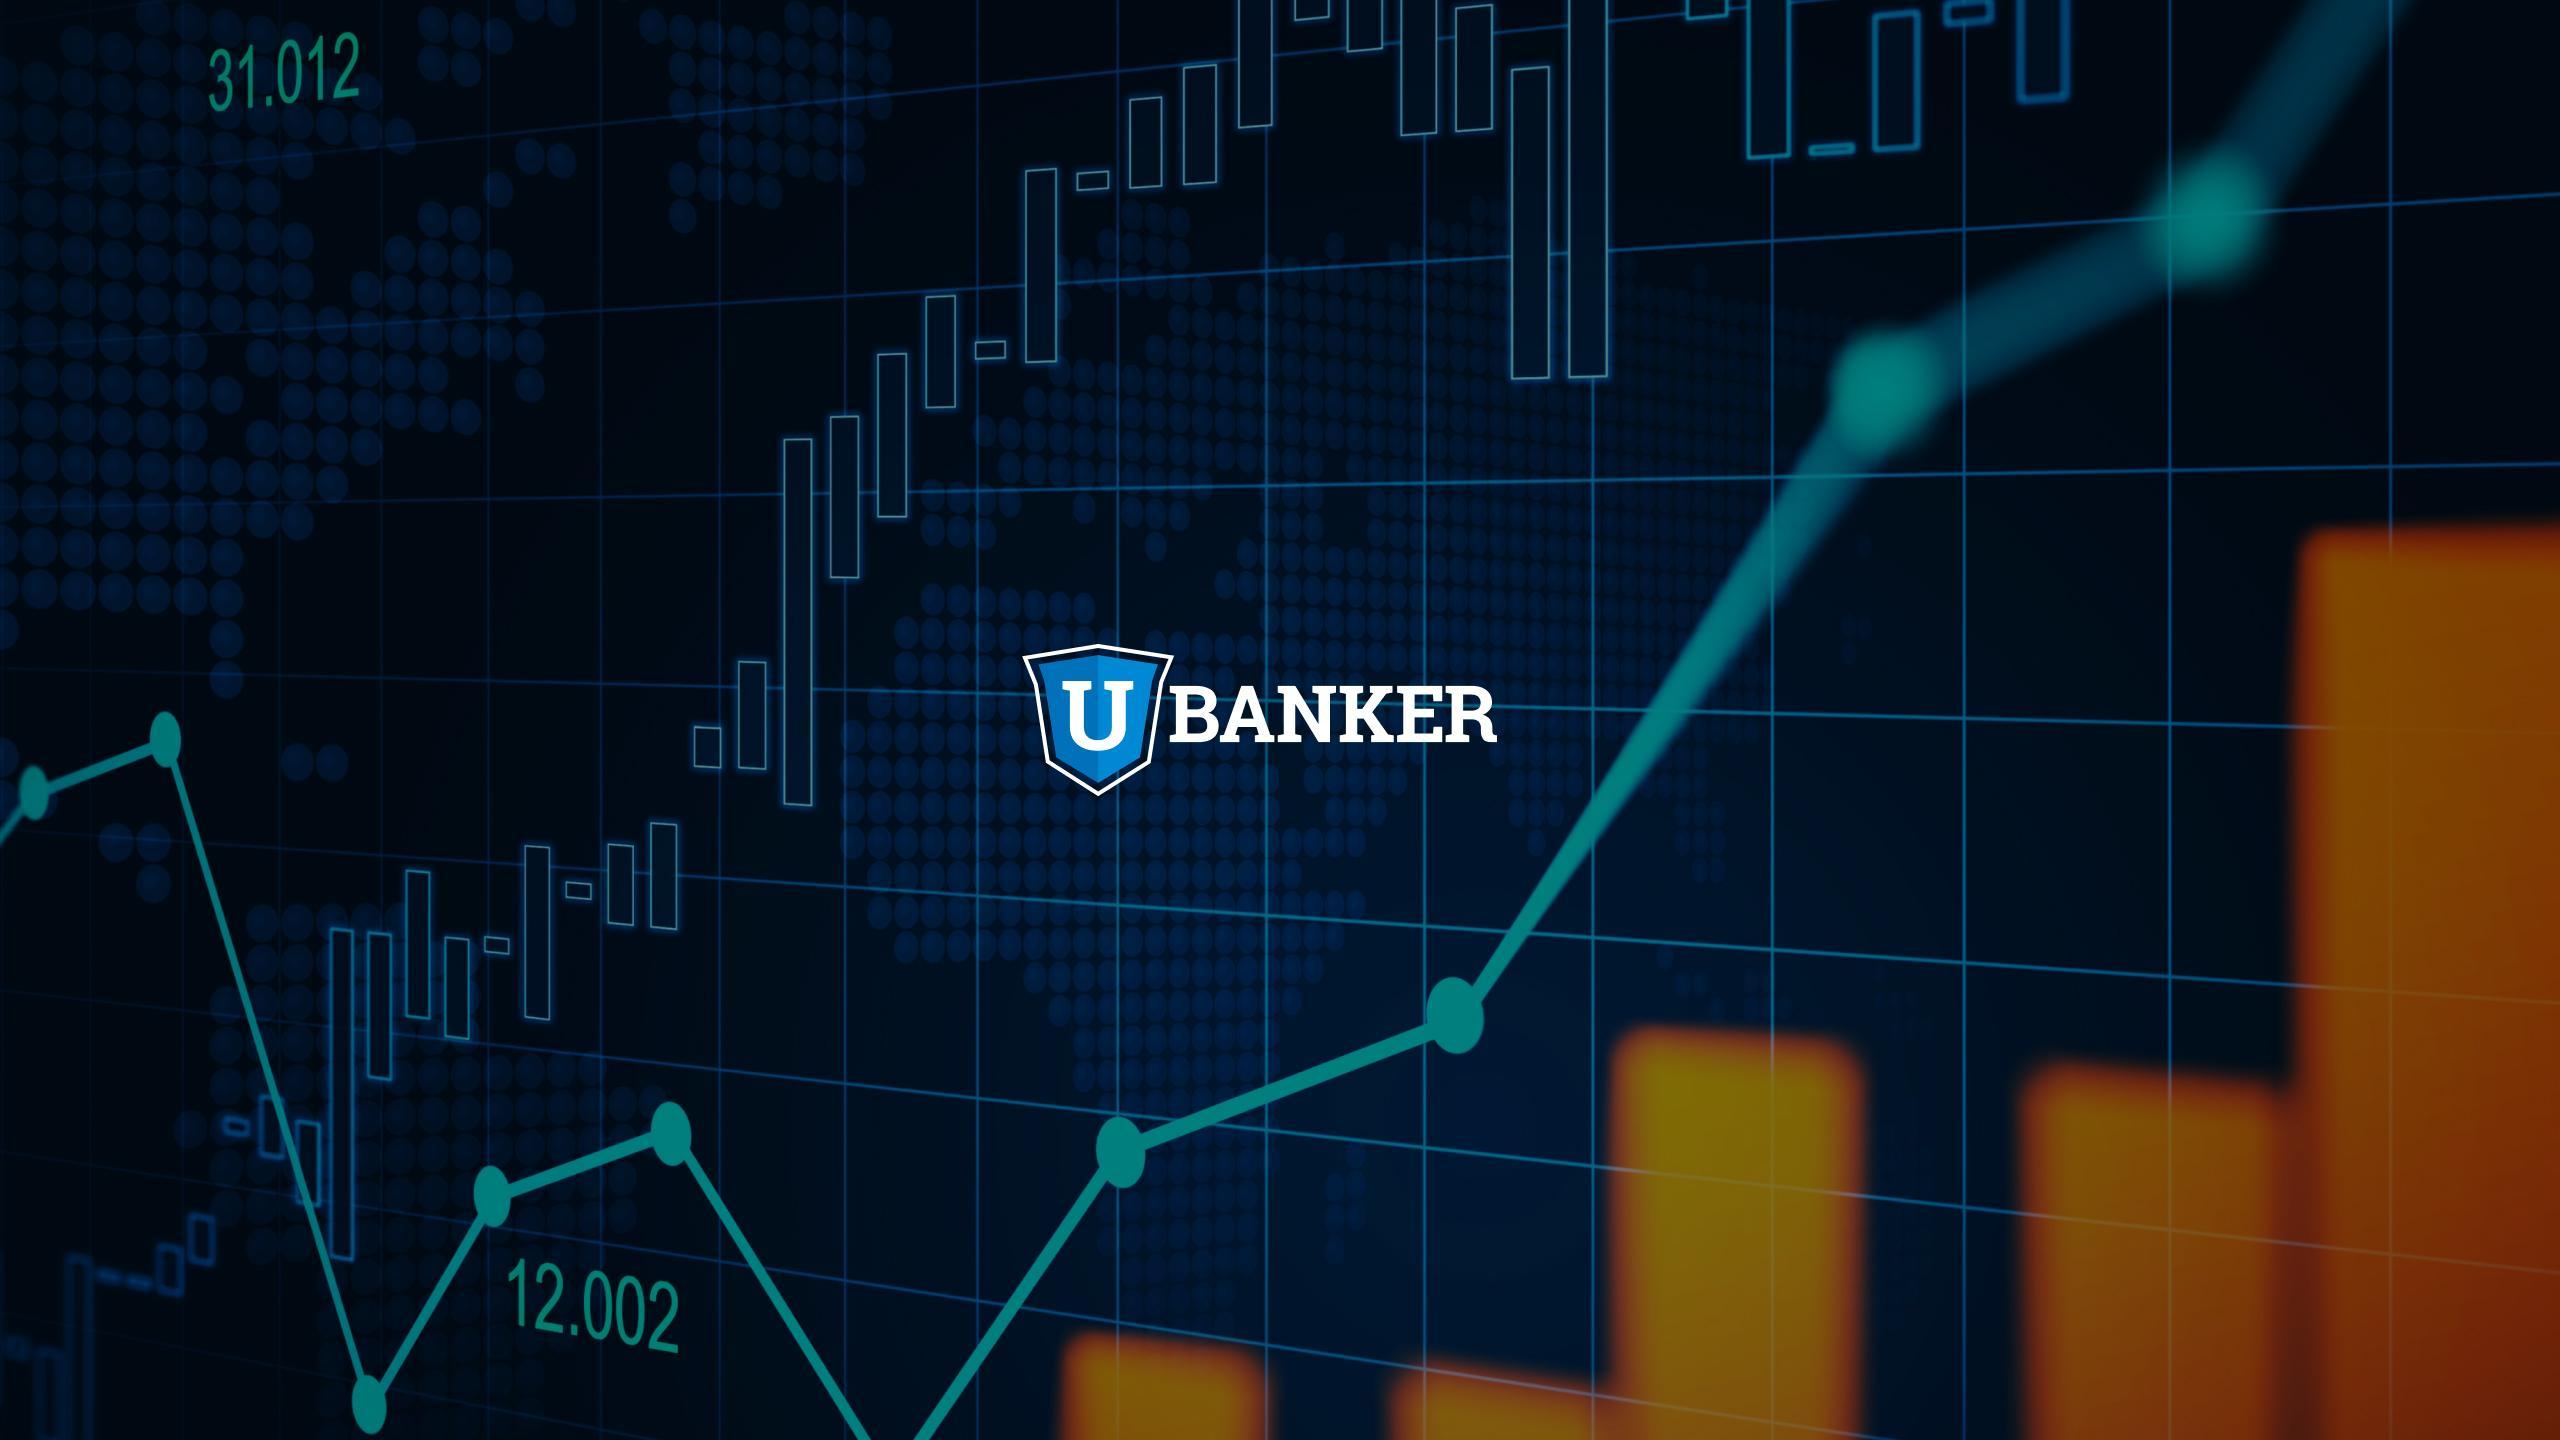 broker-ubanker